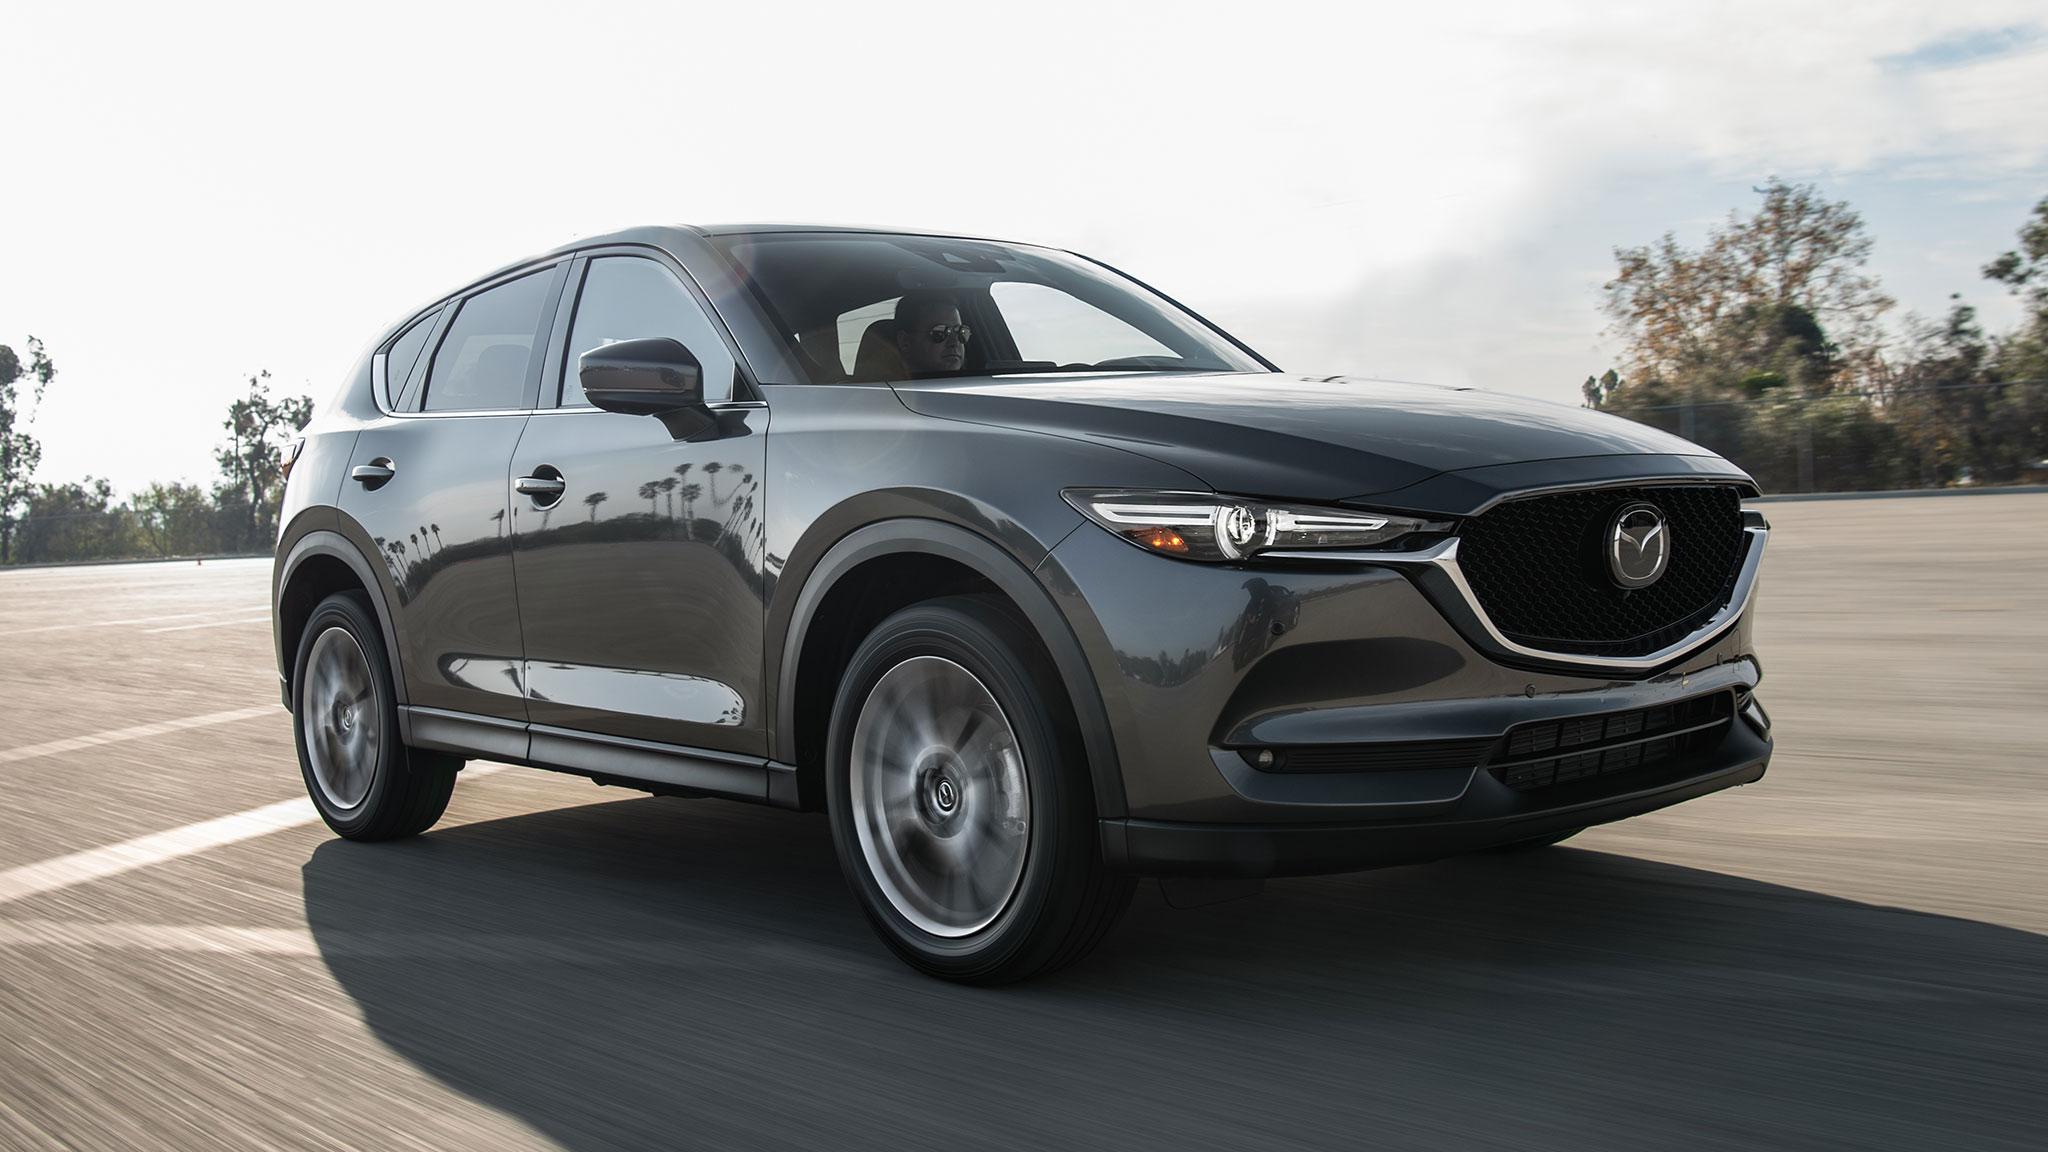 2019 Mazda CX 5 Turbo Front Three Quarter In Motion 1